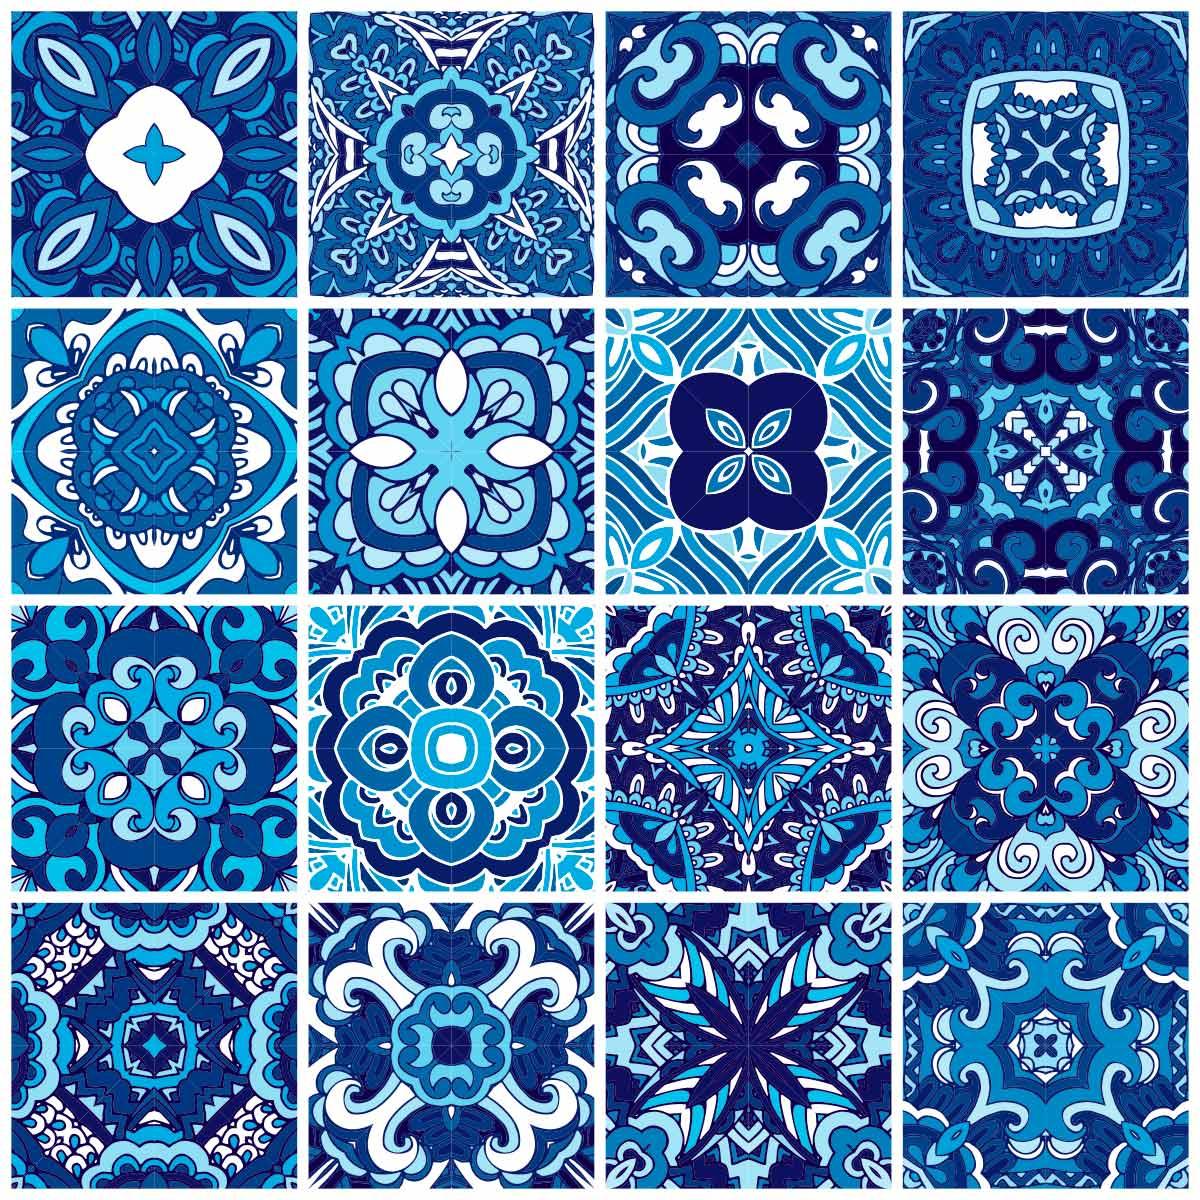 Papel de Parede Azulejo Português Geométrico Adesivo